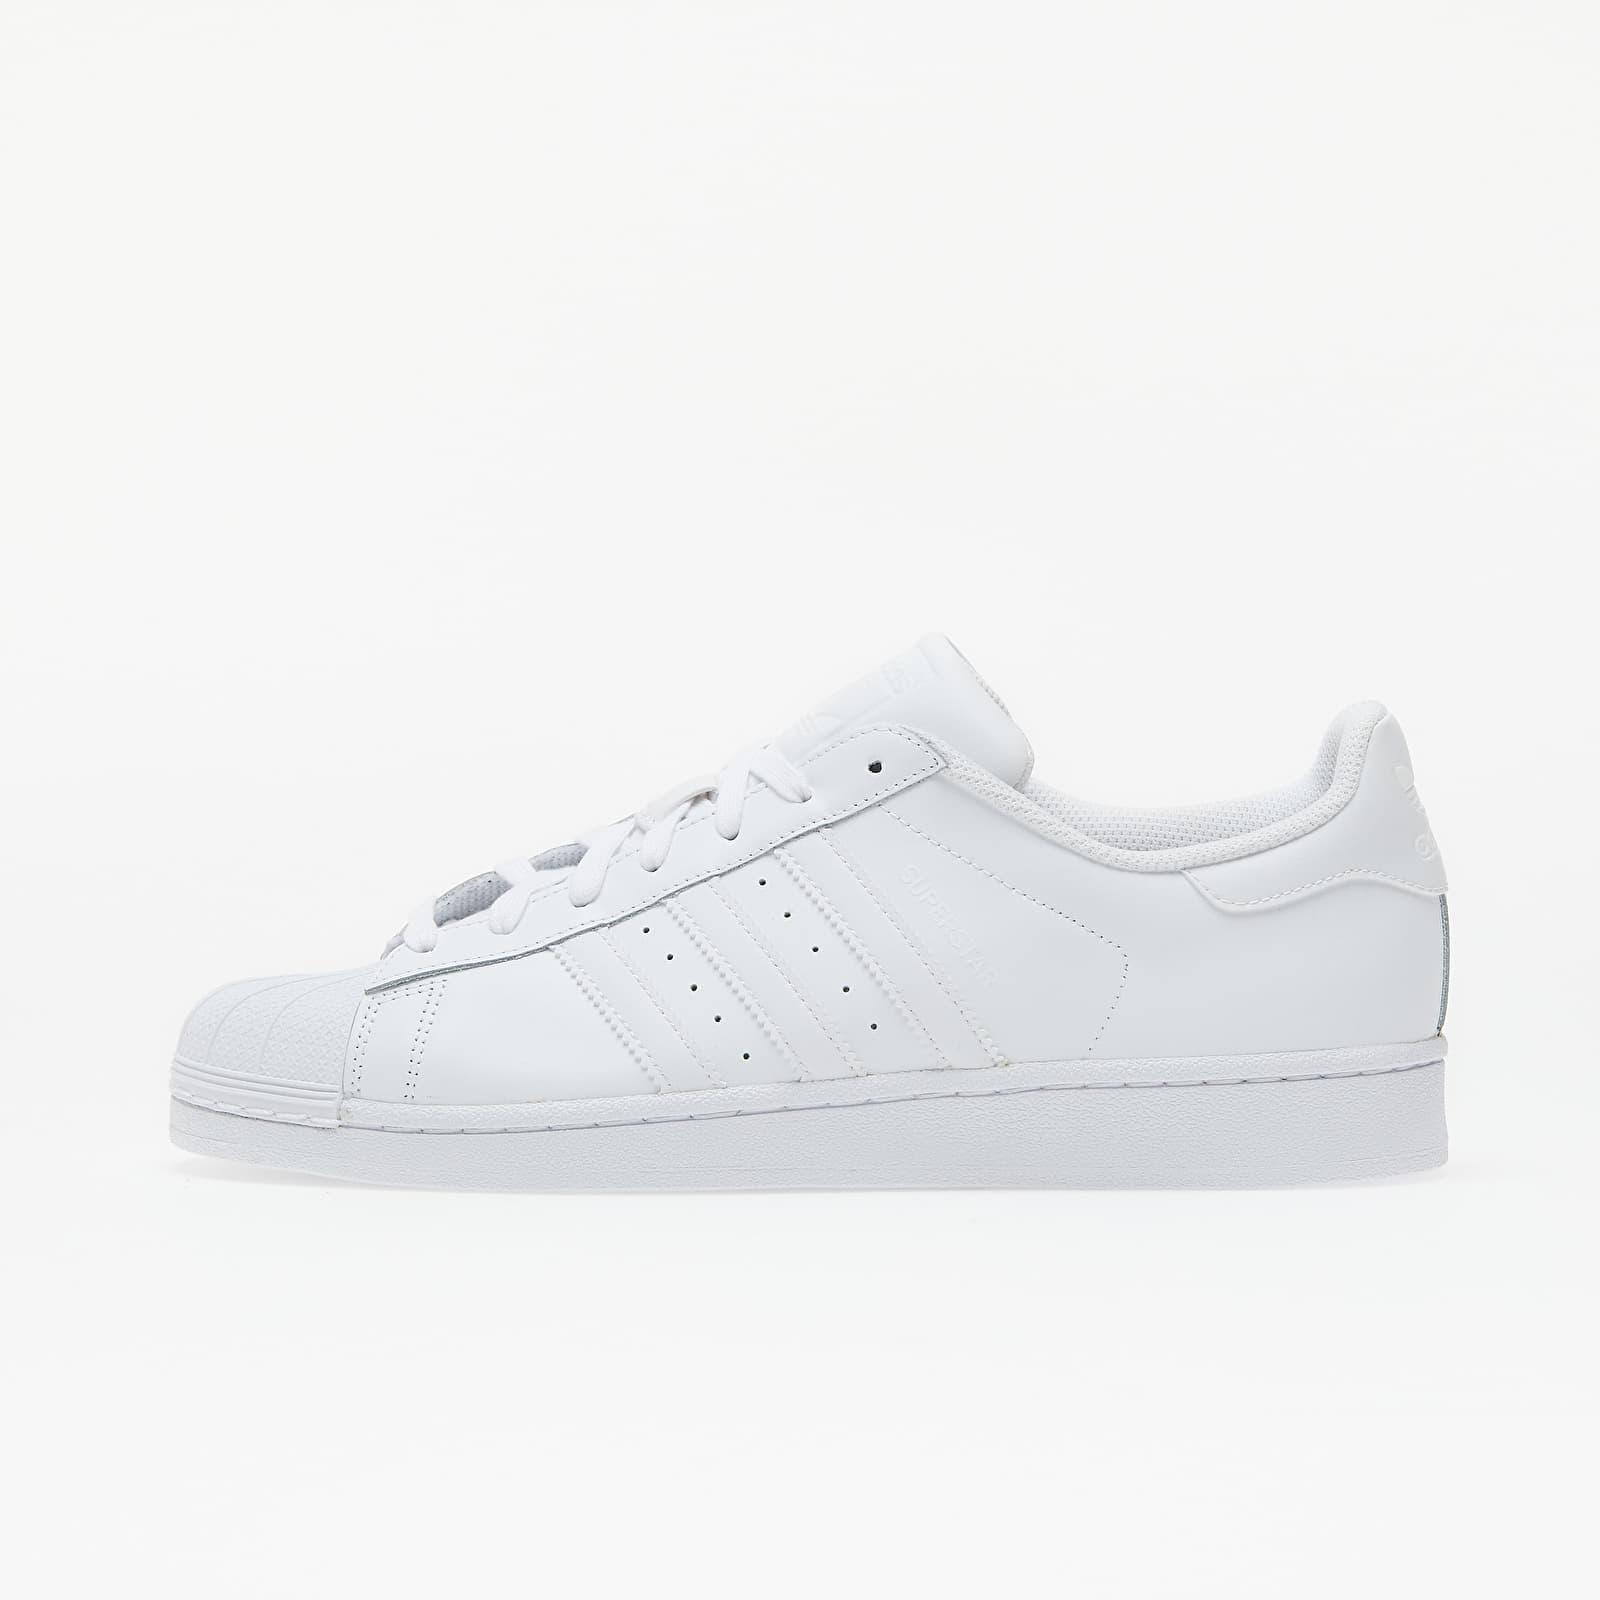 Мъжки кецове и обувки adidas Superstar Foundation Ftw White/ Ftw White/ Ftw White